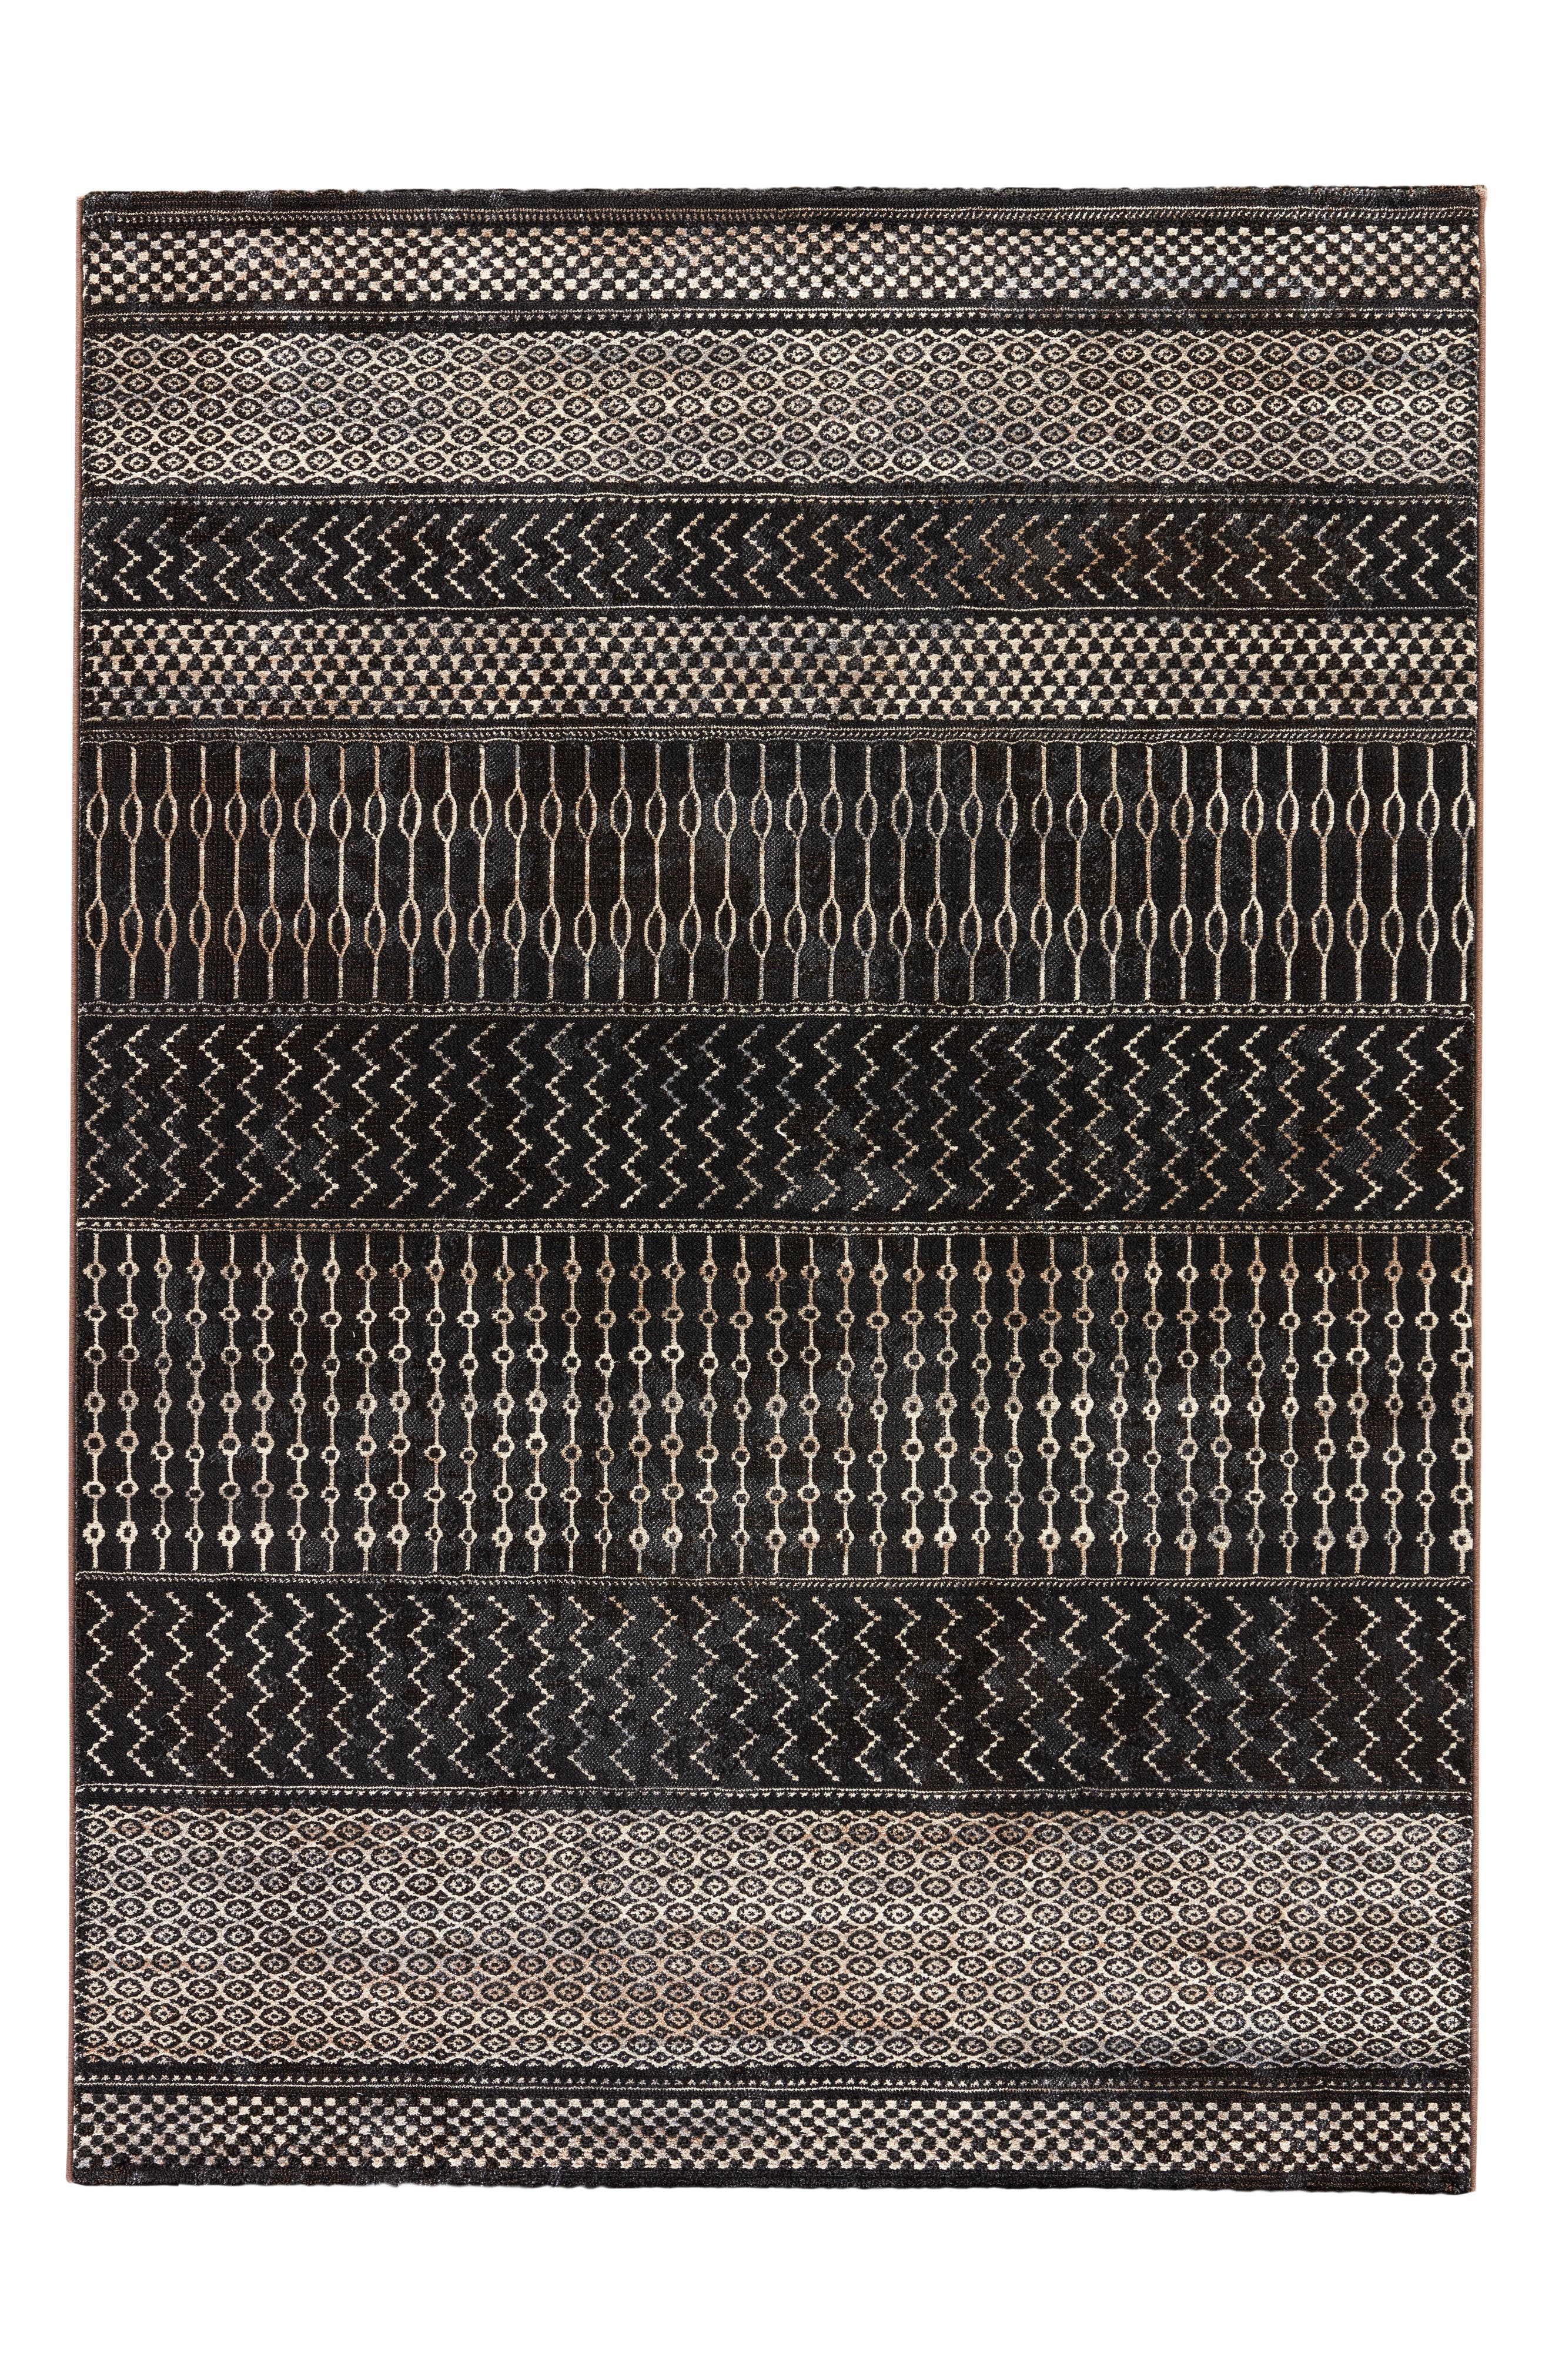 Jaipur Contemporary Loft Rug